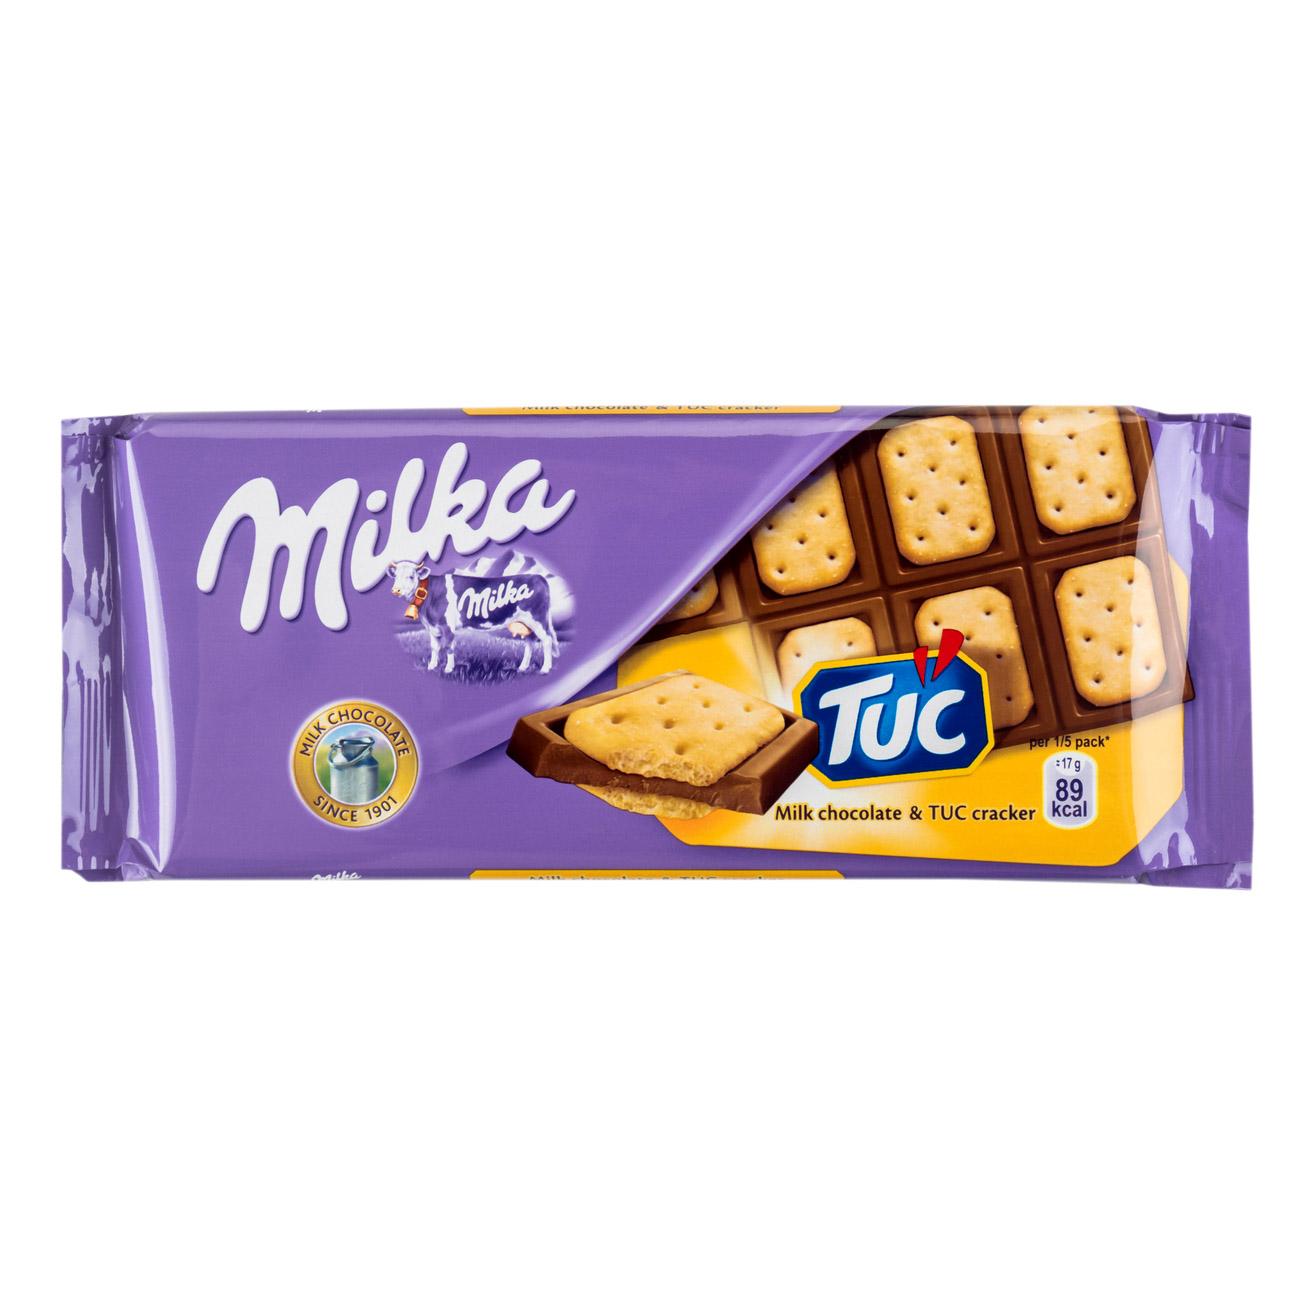 шоколад milka молочный 90 г Шоколад молочный Milka с соленым крекером Tuc 87 г